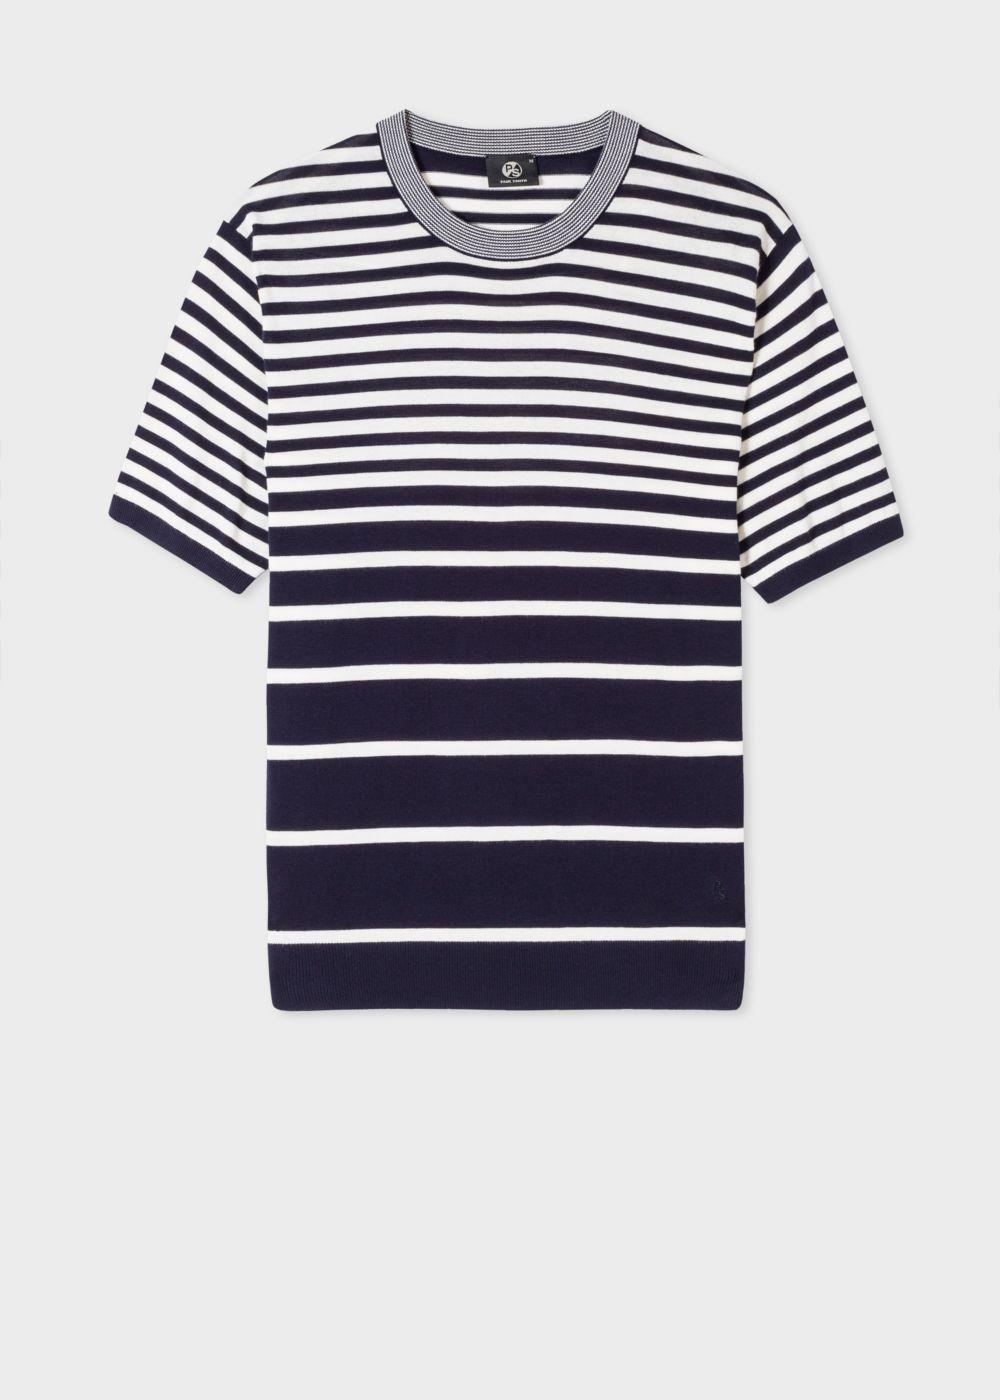 dd4dbc865fdd Men s Navy And White Gradient Stripe Short-Sleeve Cotton Sweater